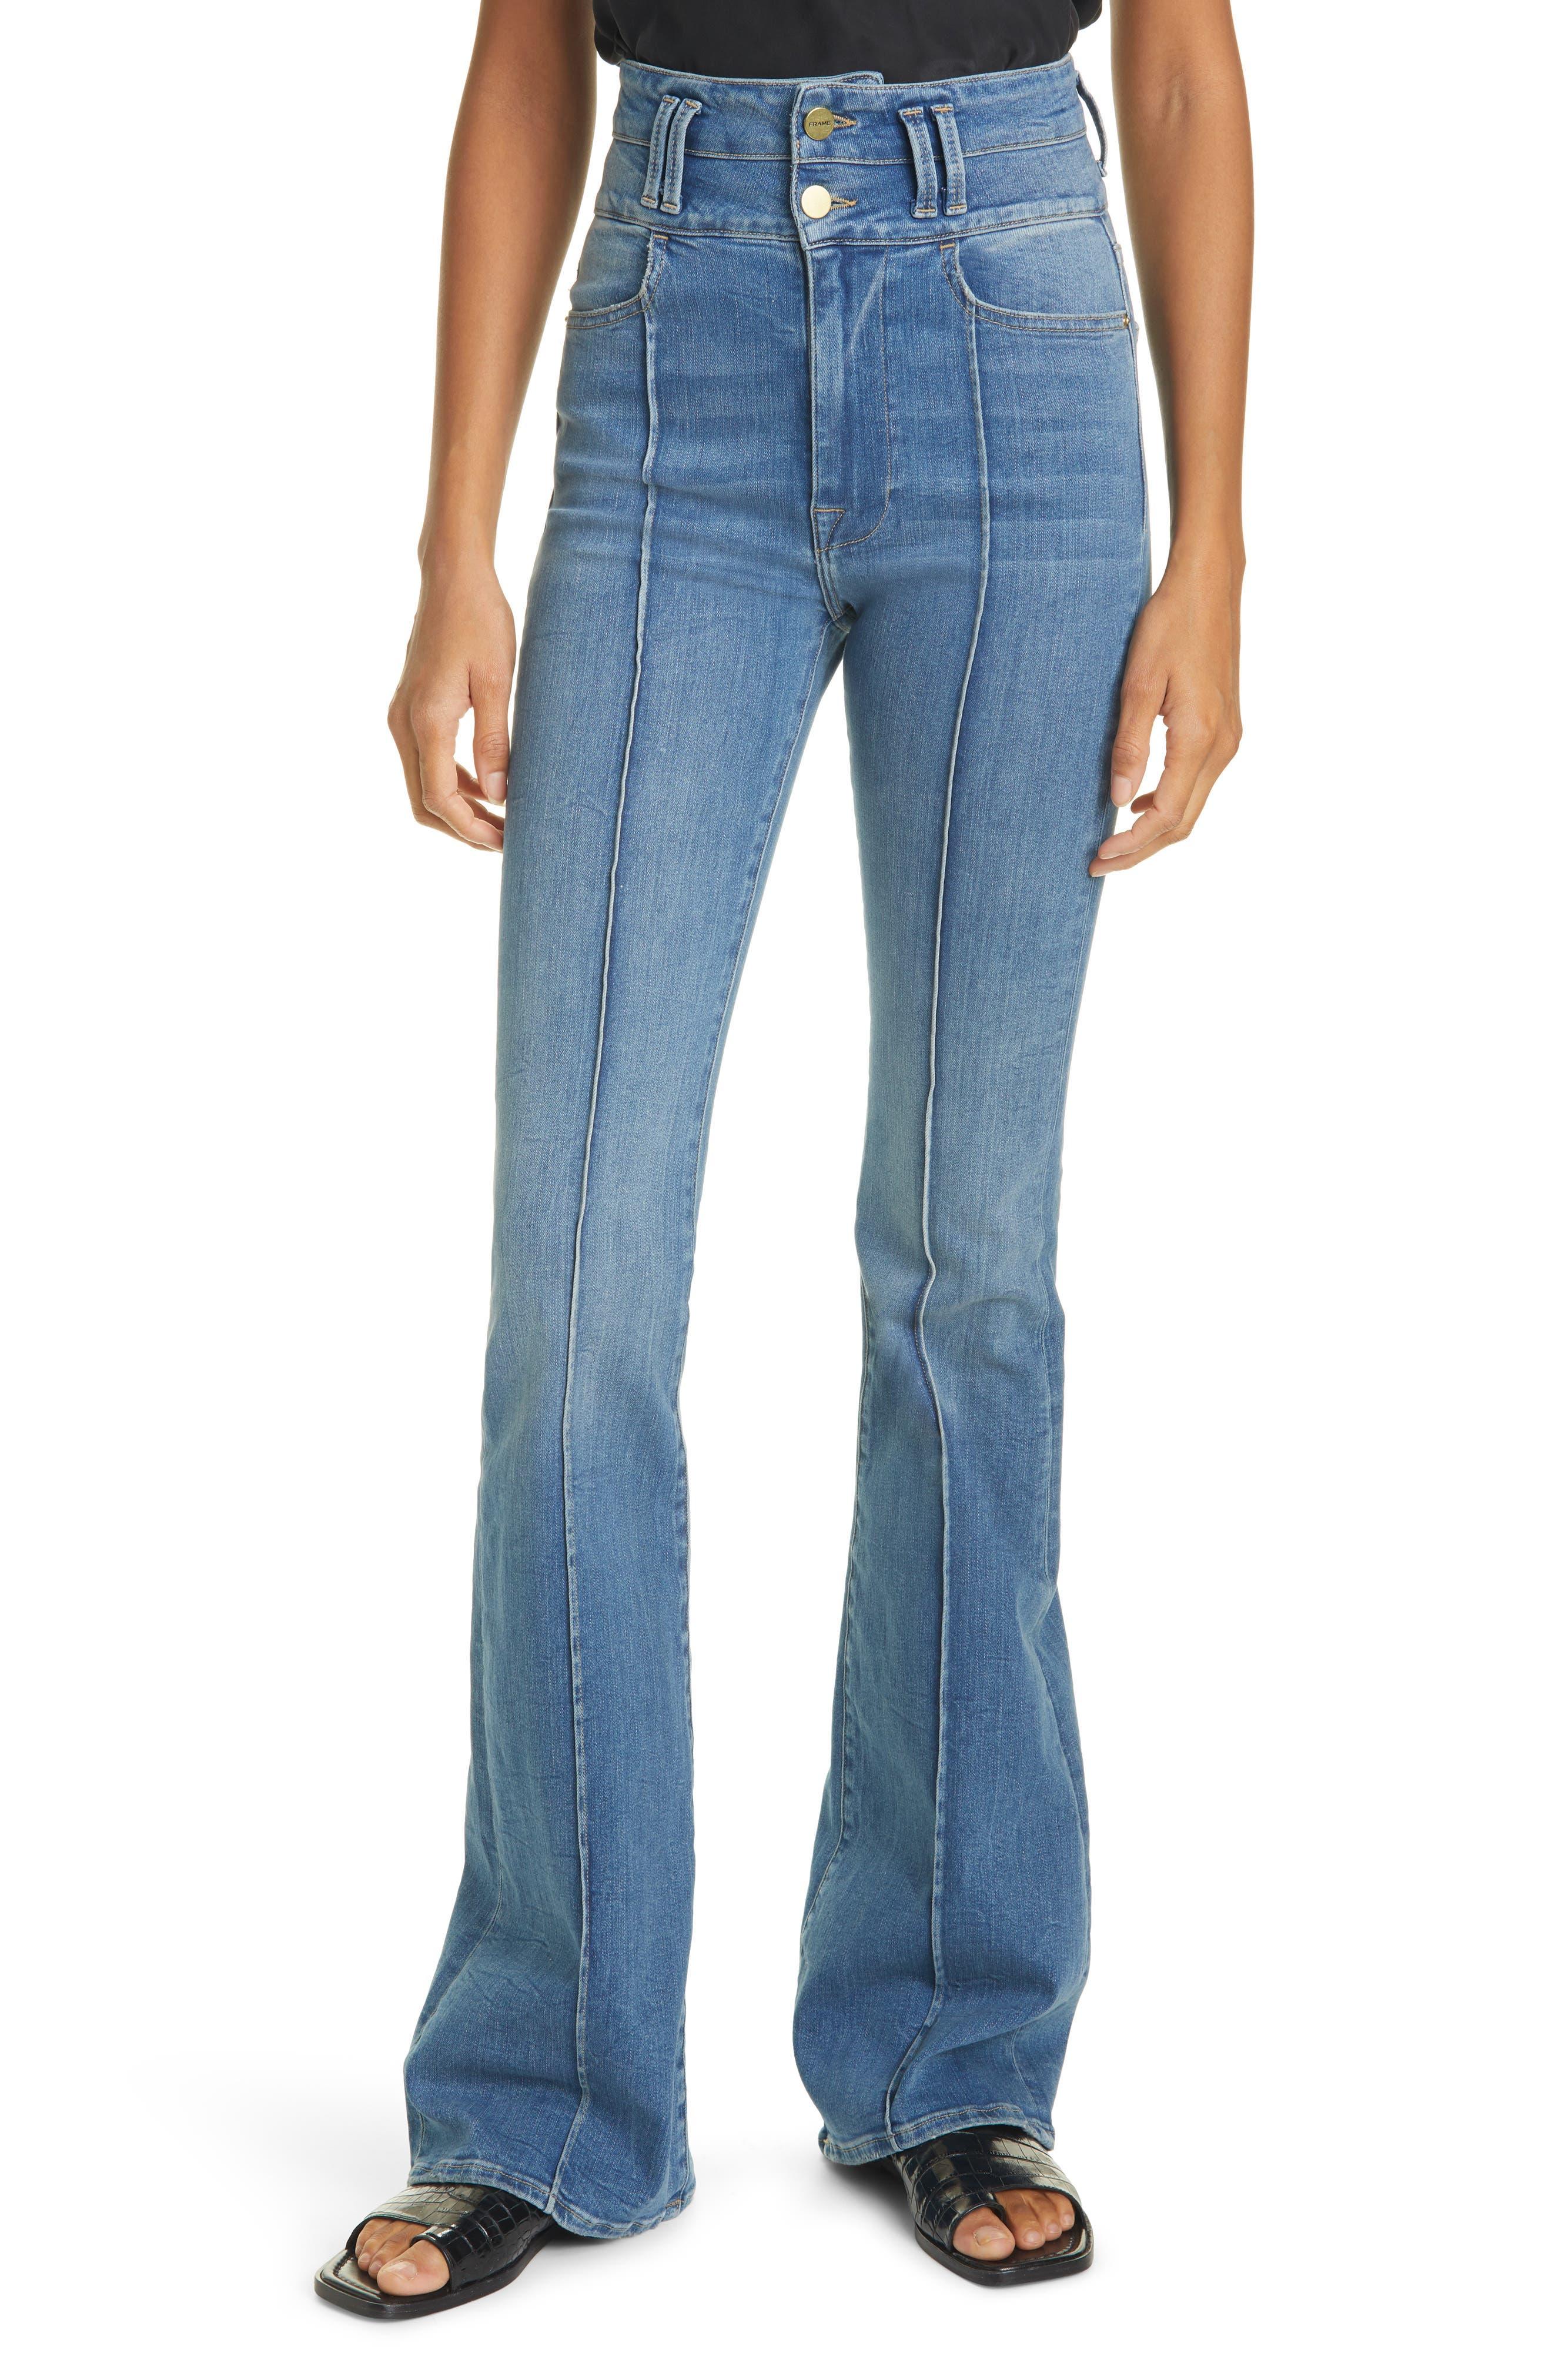 Women's Frame Le Catroux Center Seam High Waist Flare Jeans